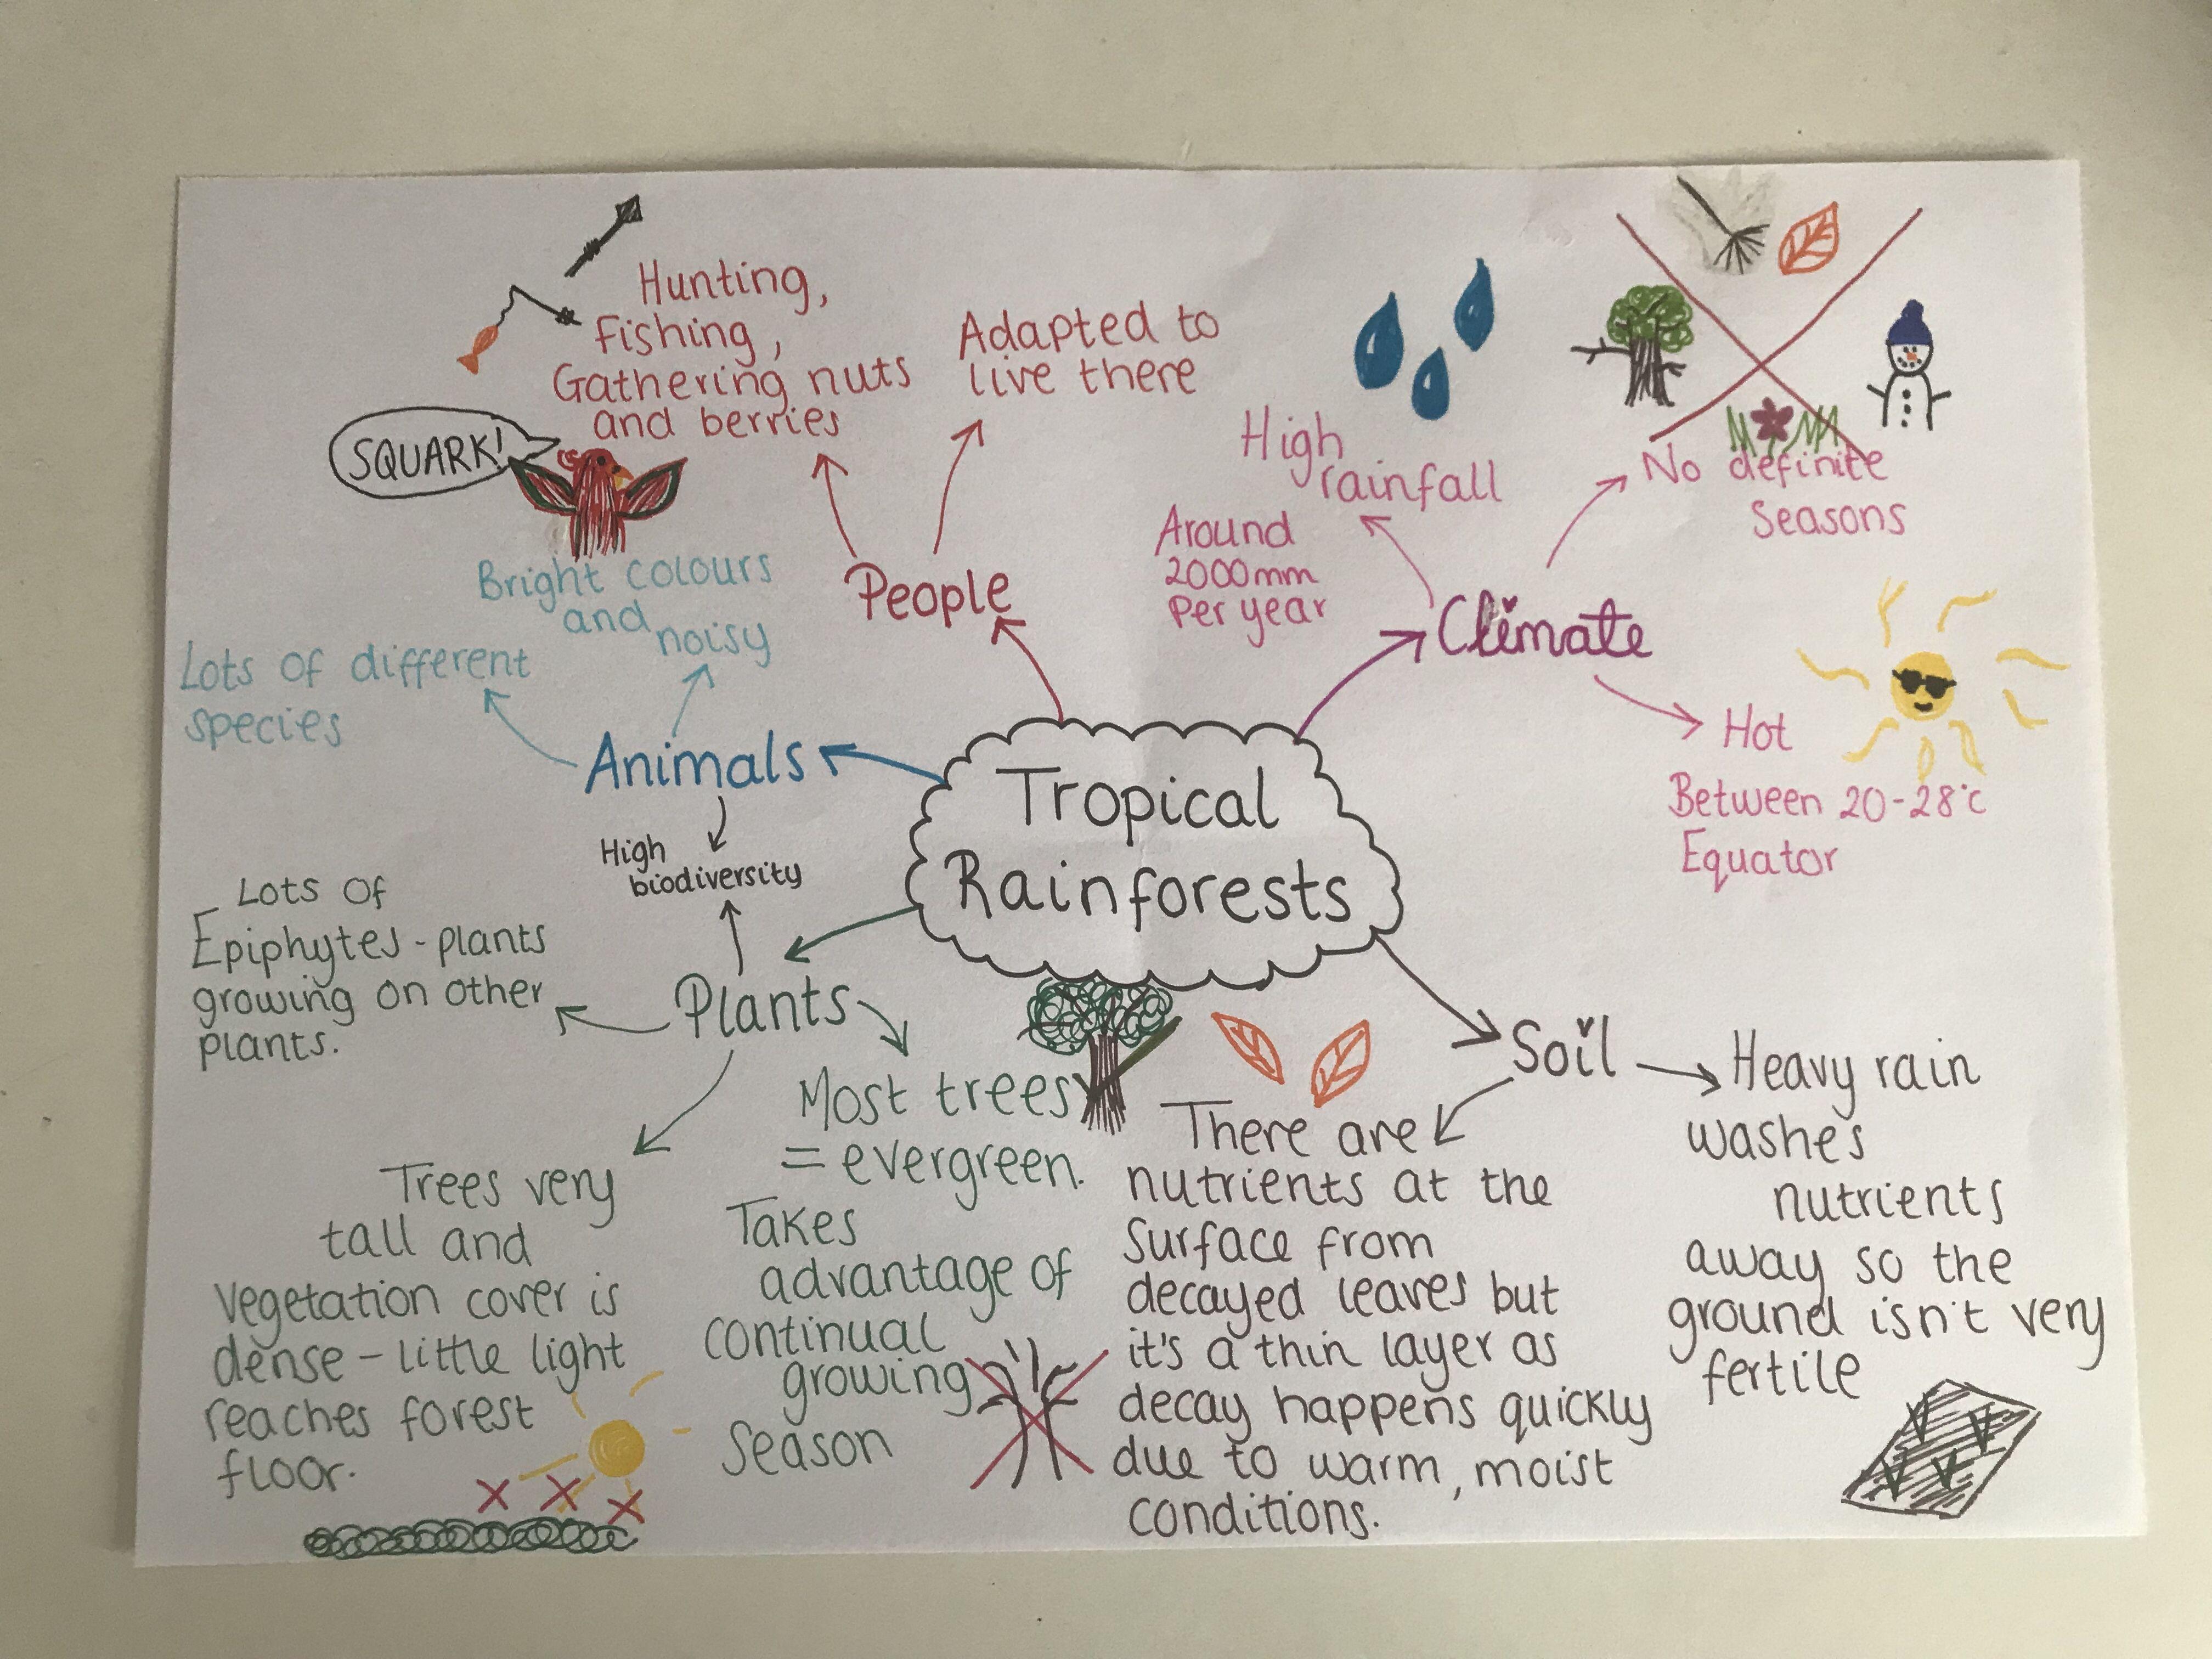 AQA GCSE Geography Revision The Living World 🌍 Gcse